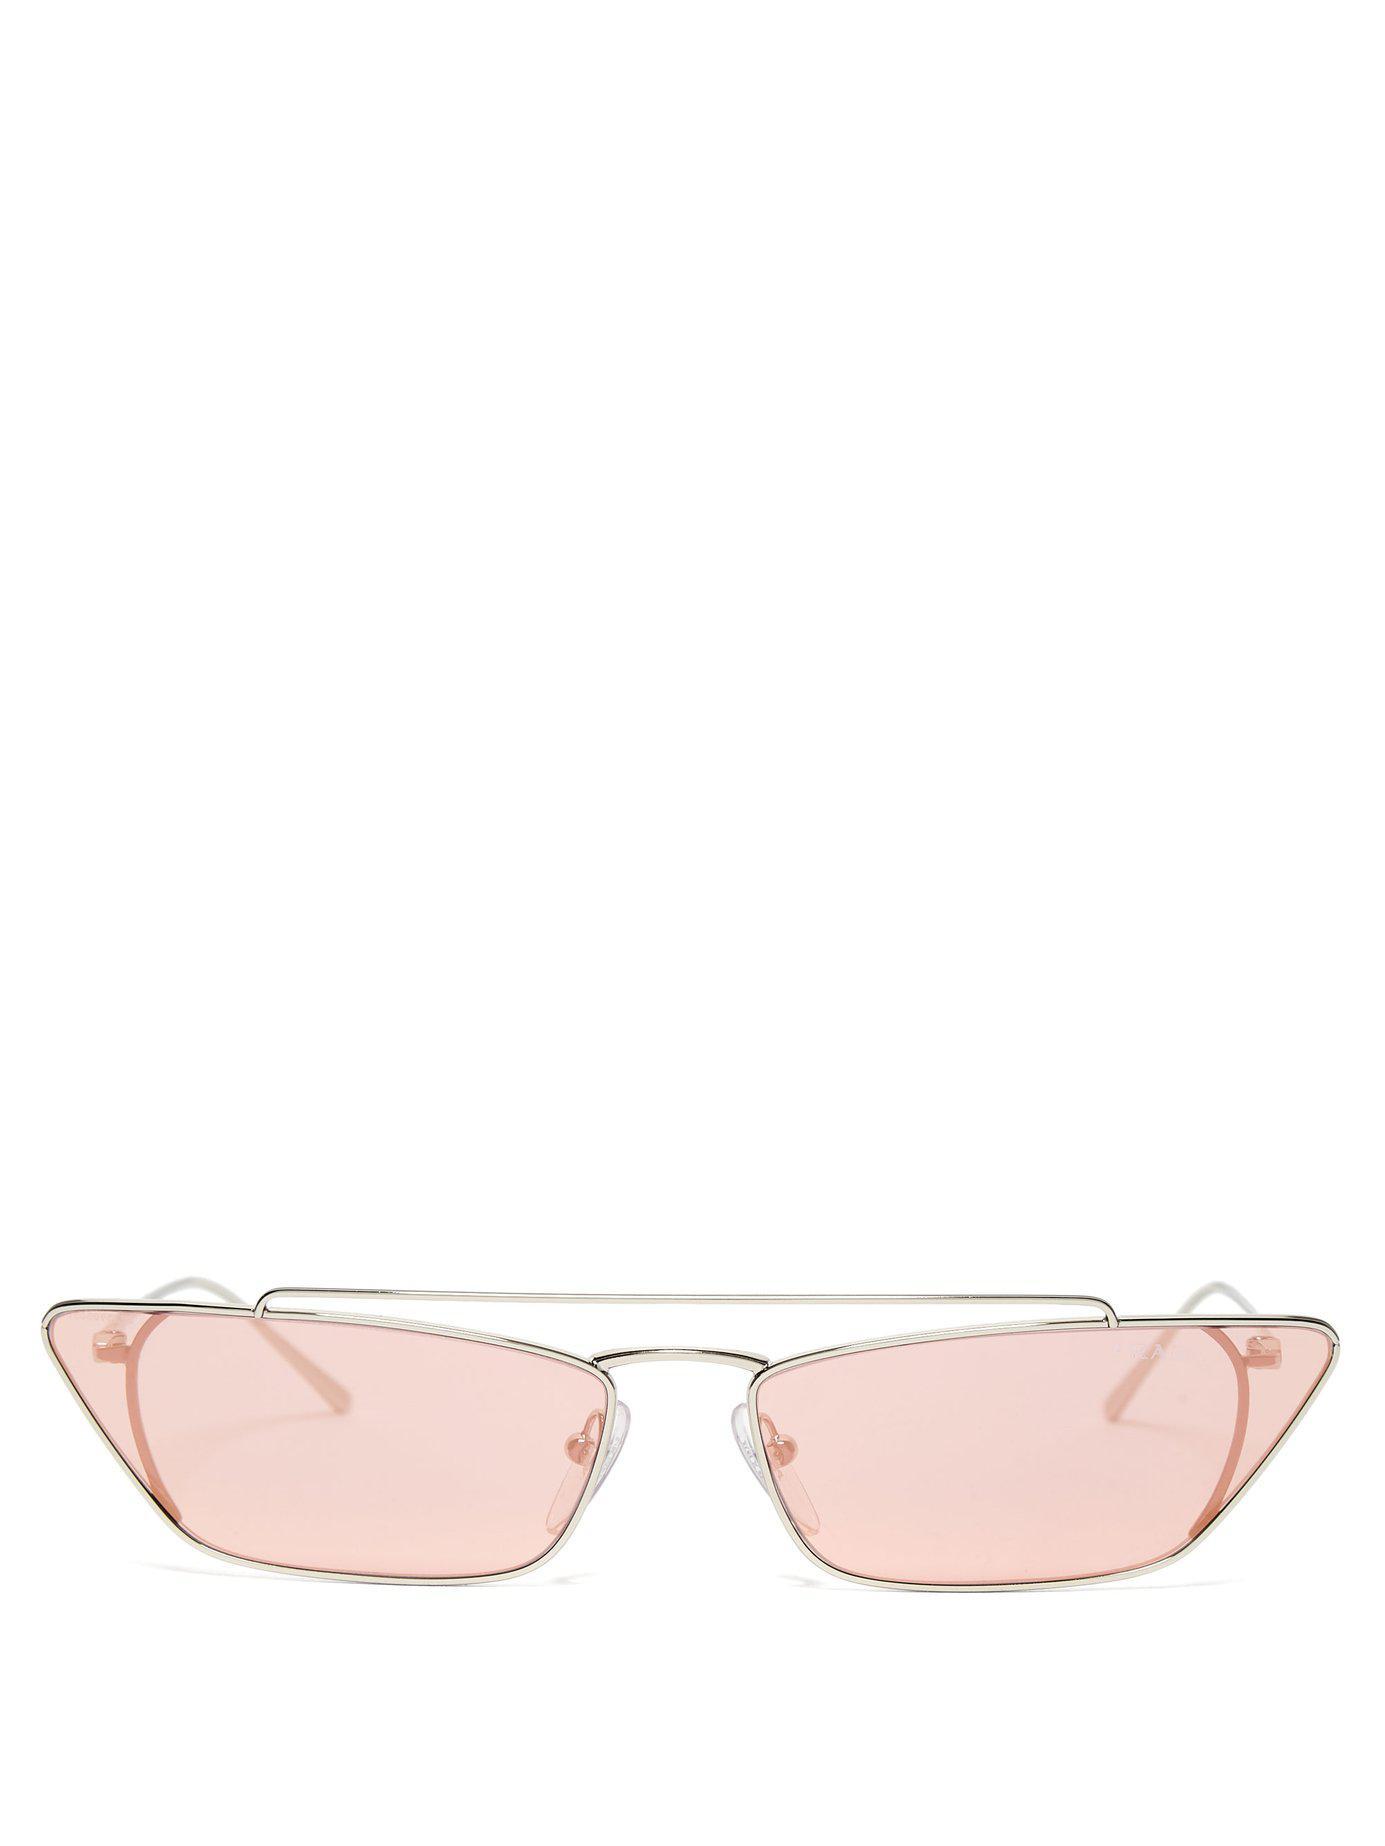 84b11194dd Lyst - Prada Ultravox Rectangular Frame Metal Sunglasses in Pink